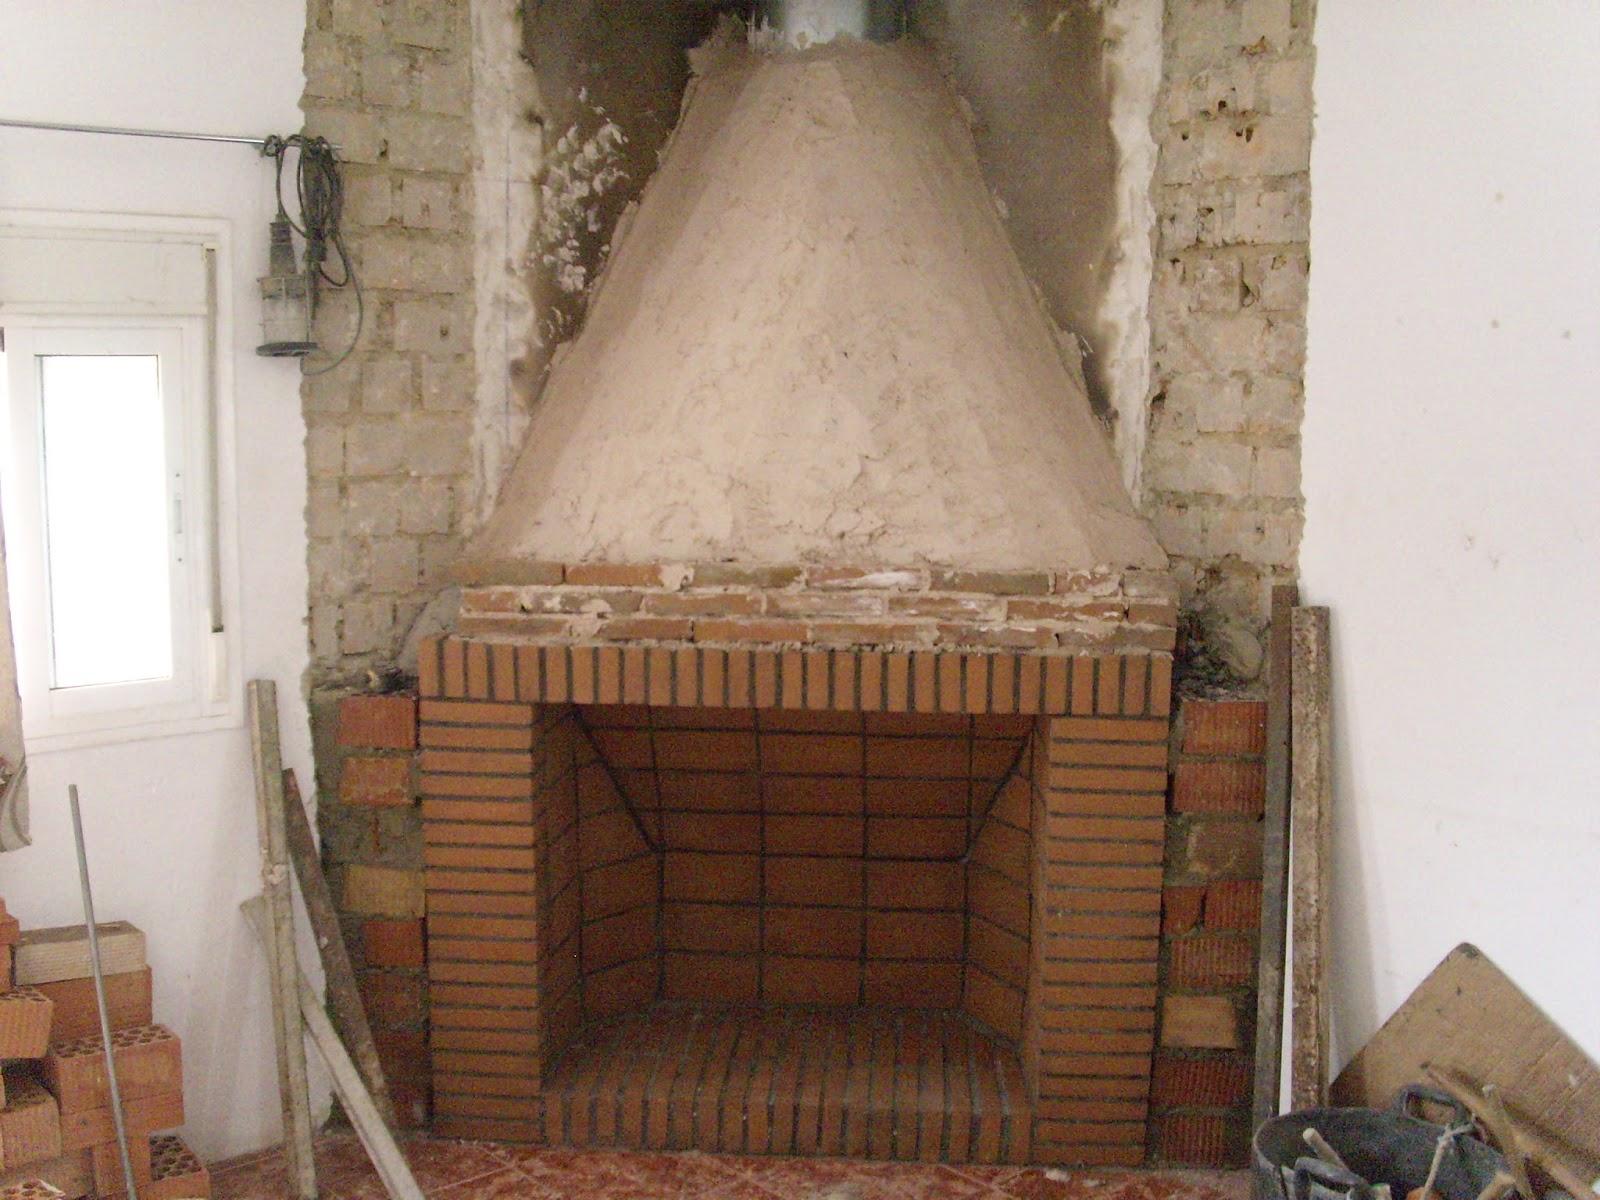 Construcci n tradicional geom trica como construir una - Chimenea ladrillo ...